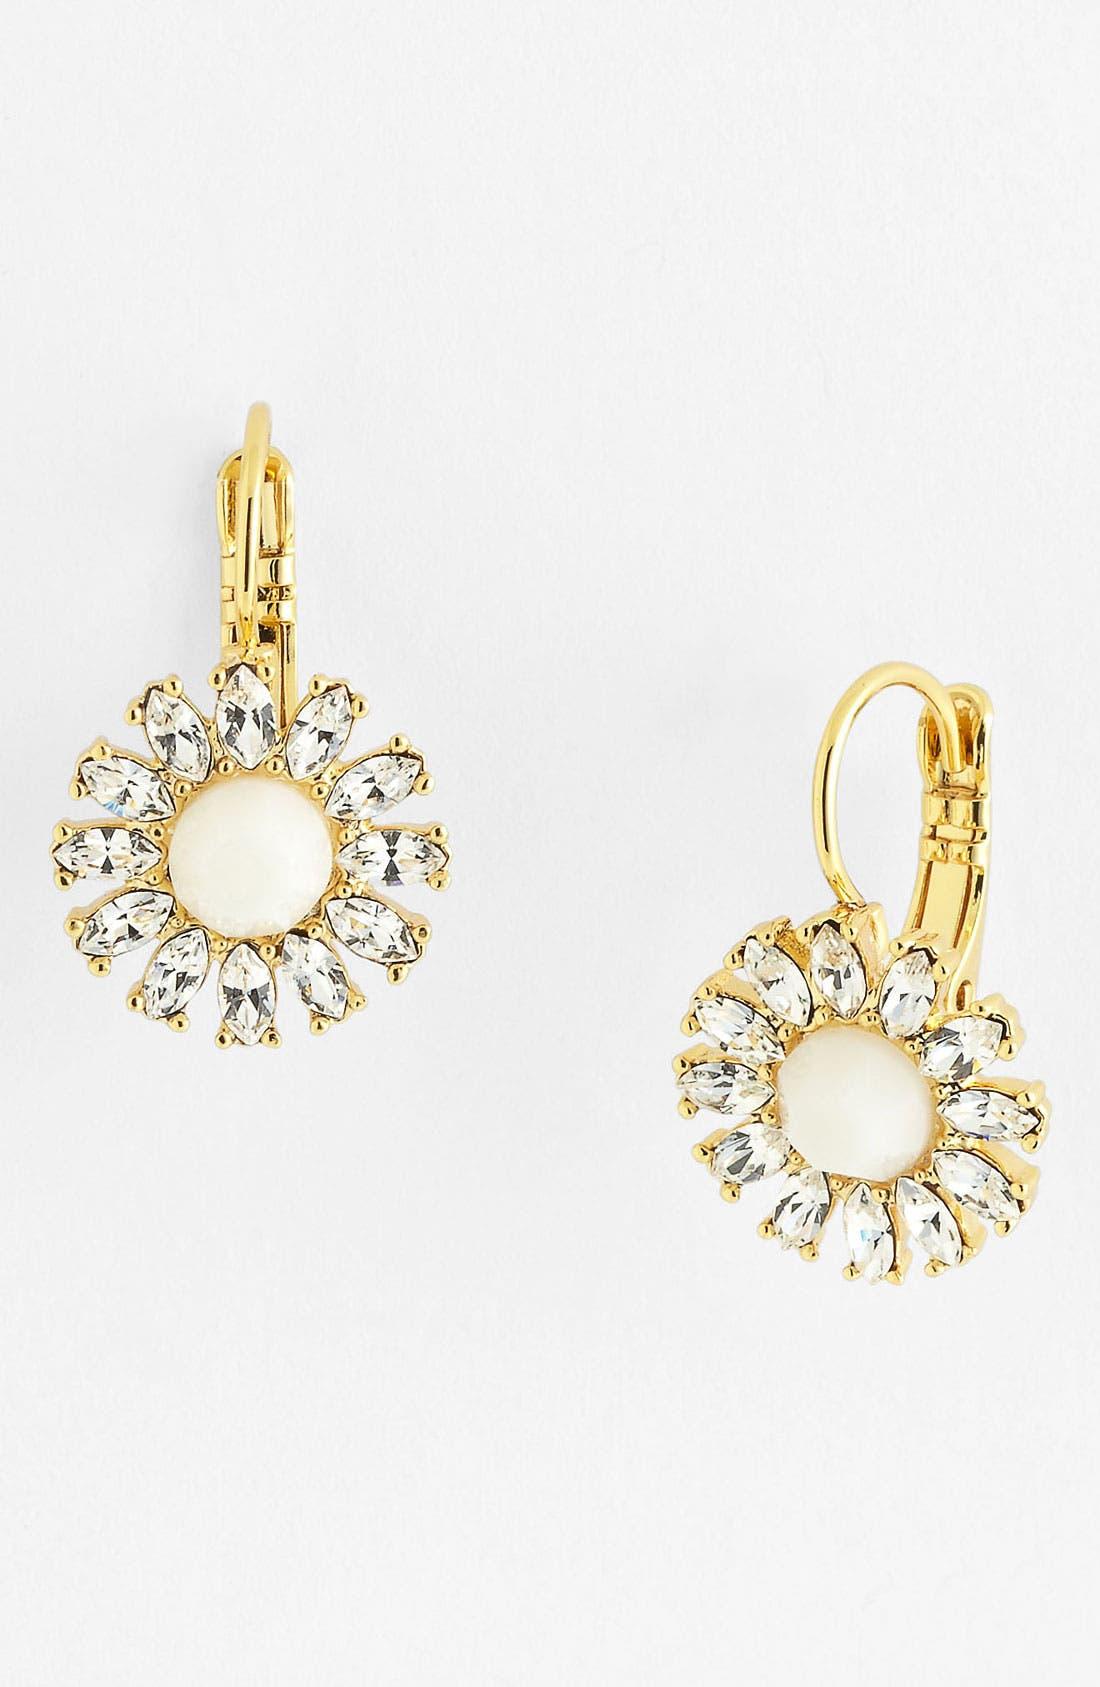 Alternate Image 1 Selected - kate spade new york 'estate garden' drop earrings